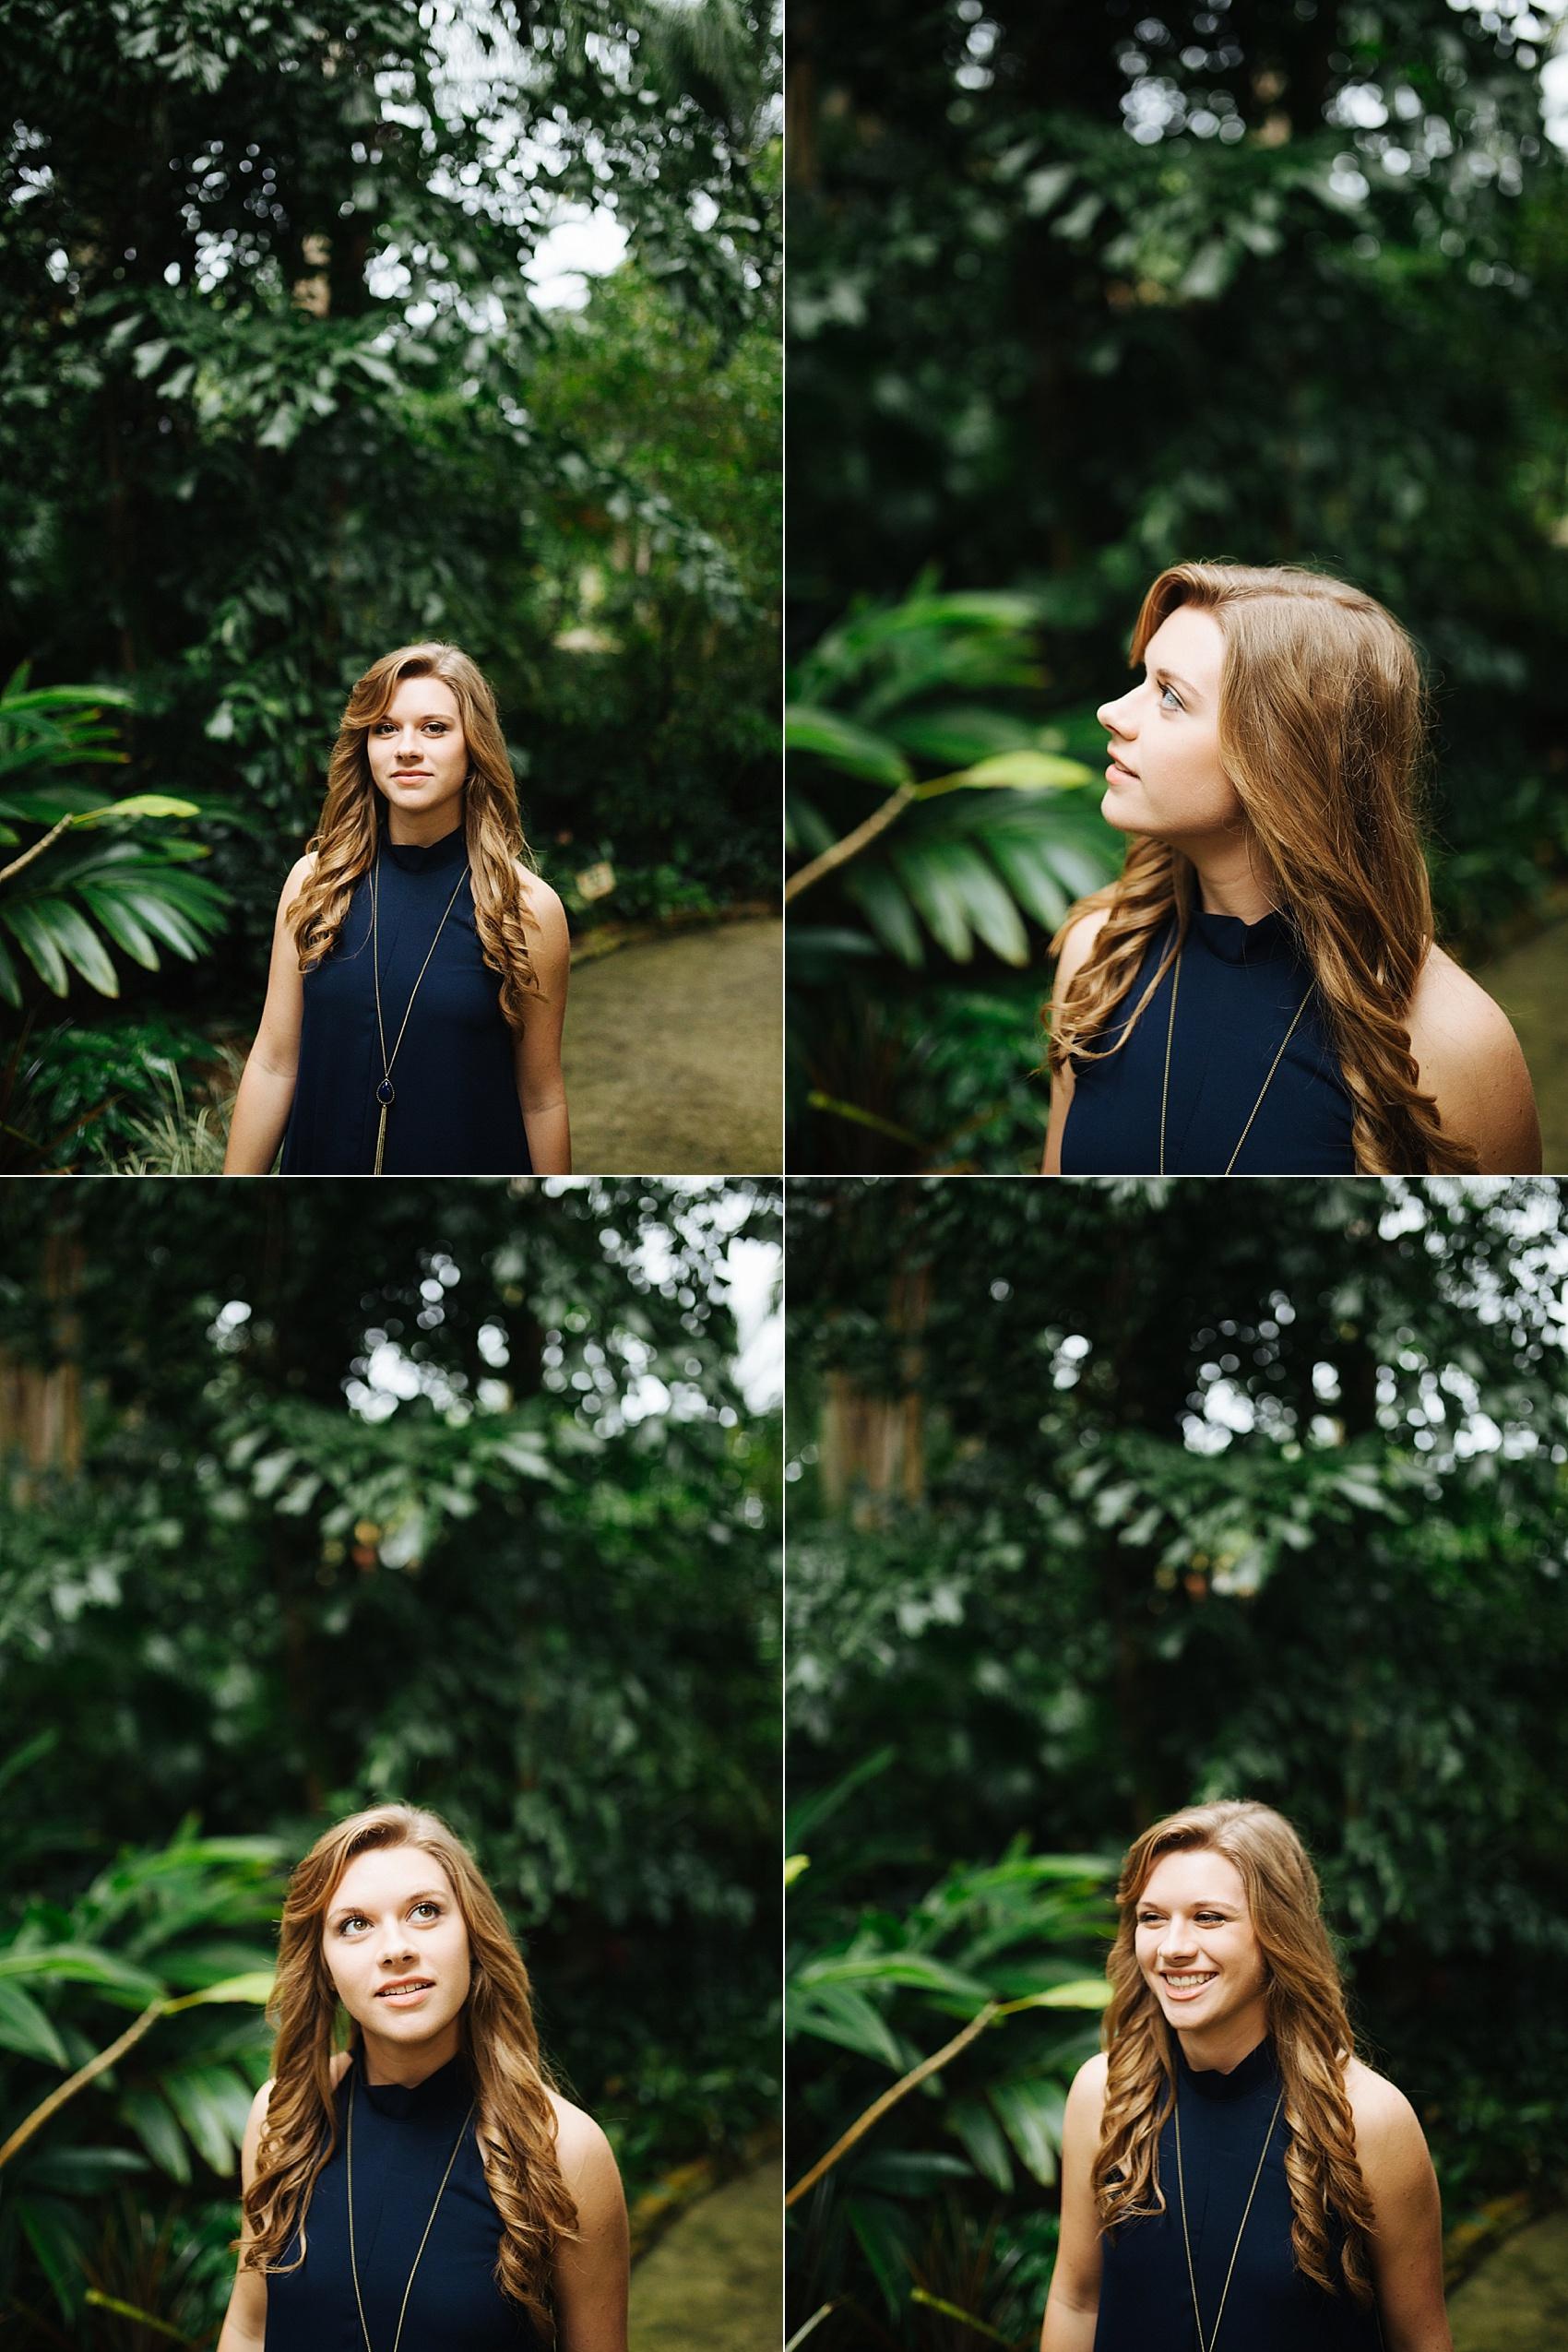 stpete senior portraits sunken gardens leah-12